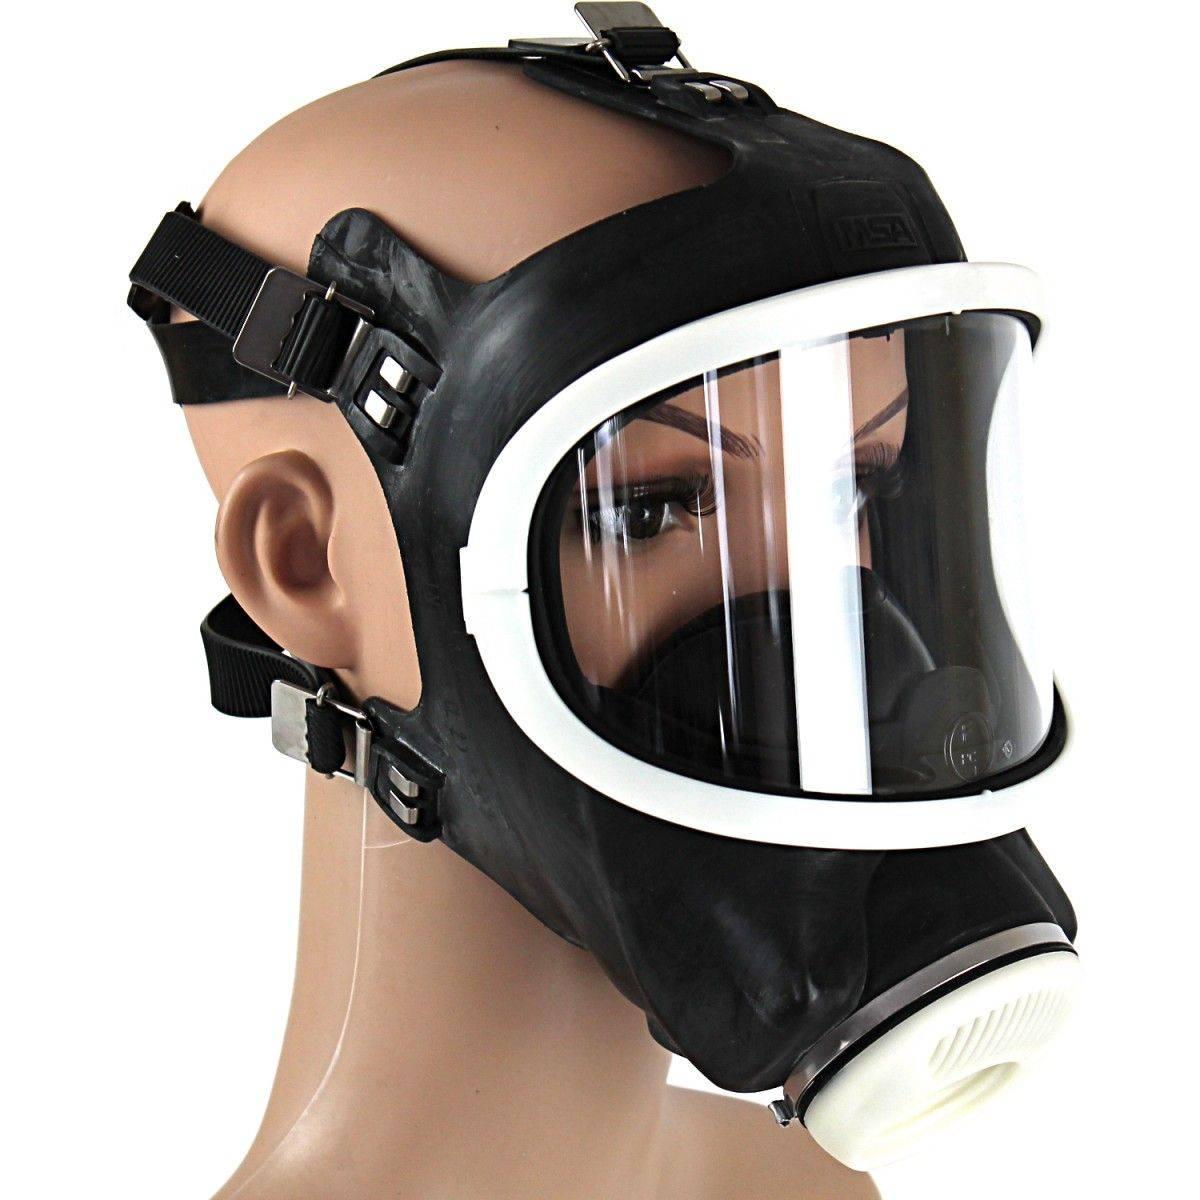 MSA-AUER-Vollmaske-Full-Face-Mask-3S-Basis-Plu_1.jpg